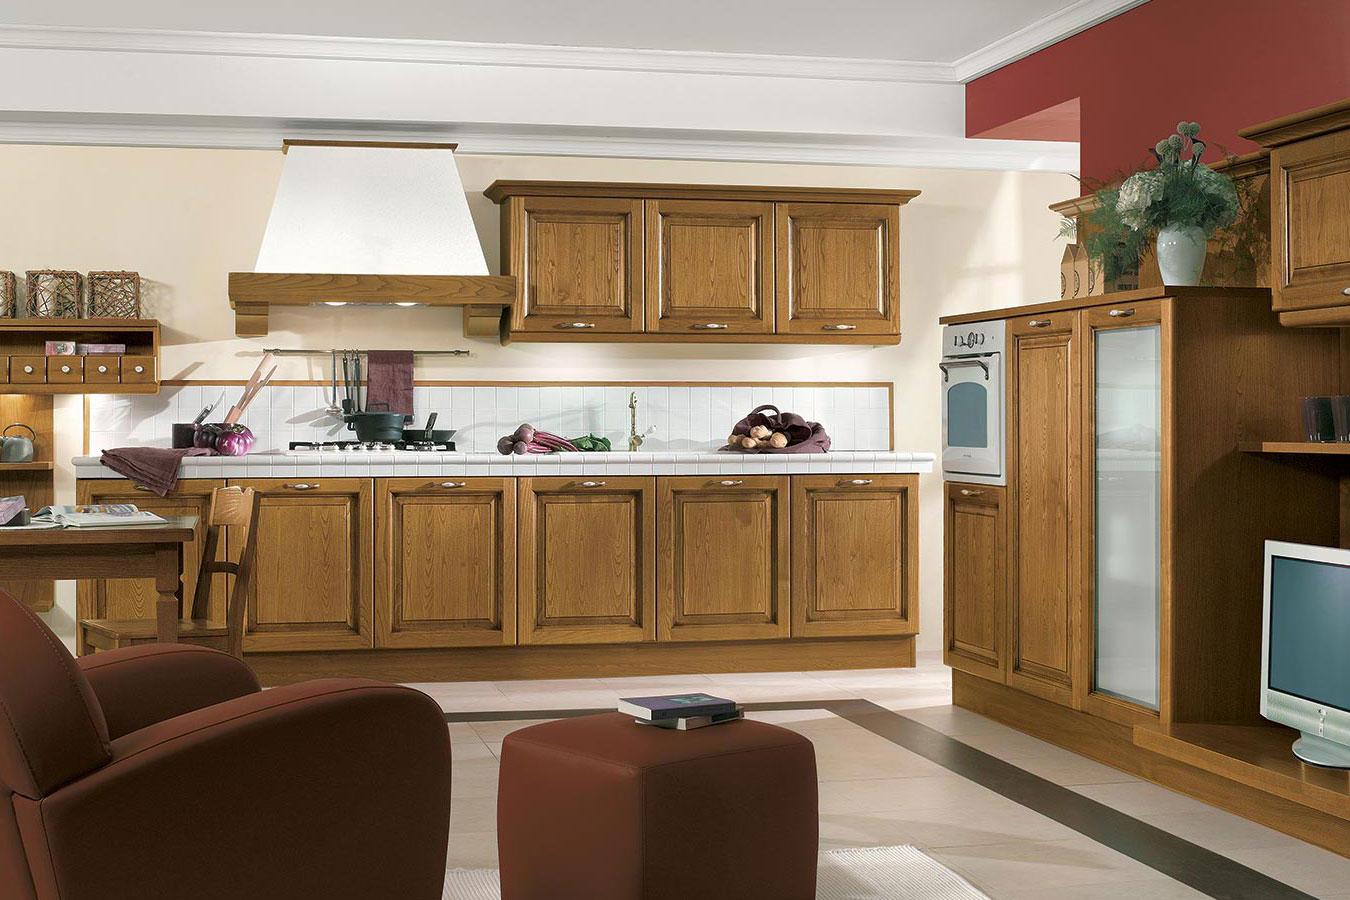 Cucina classica diana di arredo3 righetti mobili novara for Oggettistica cucina online